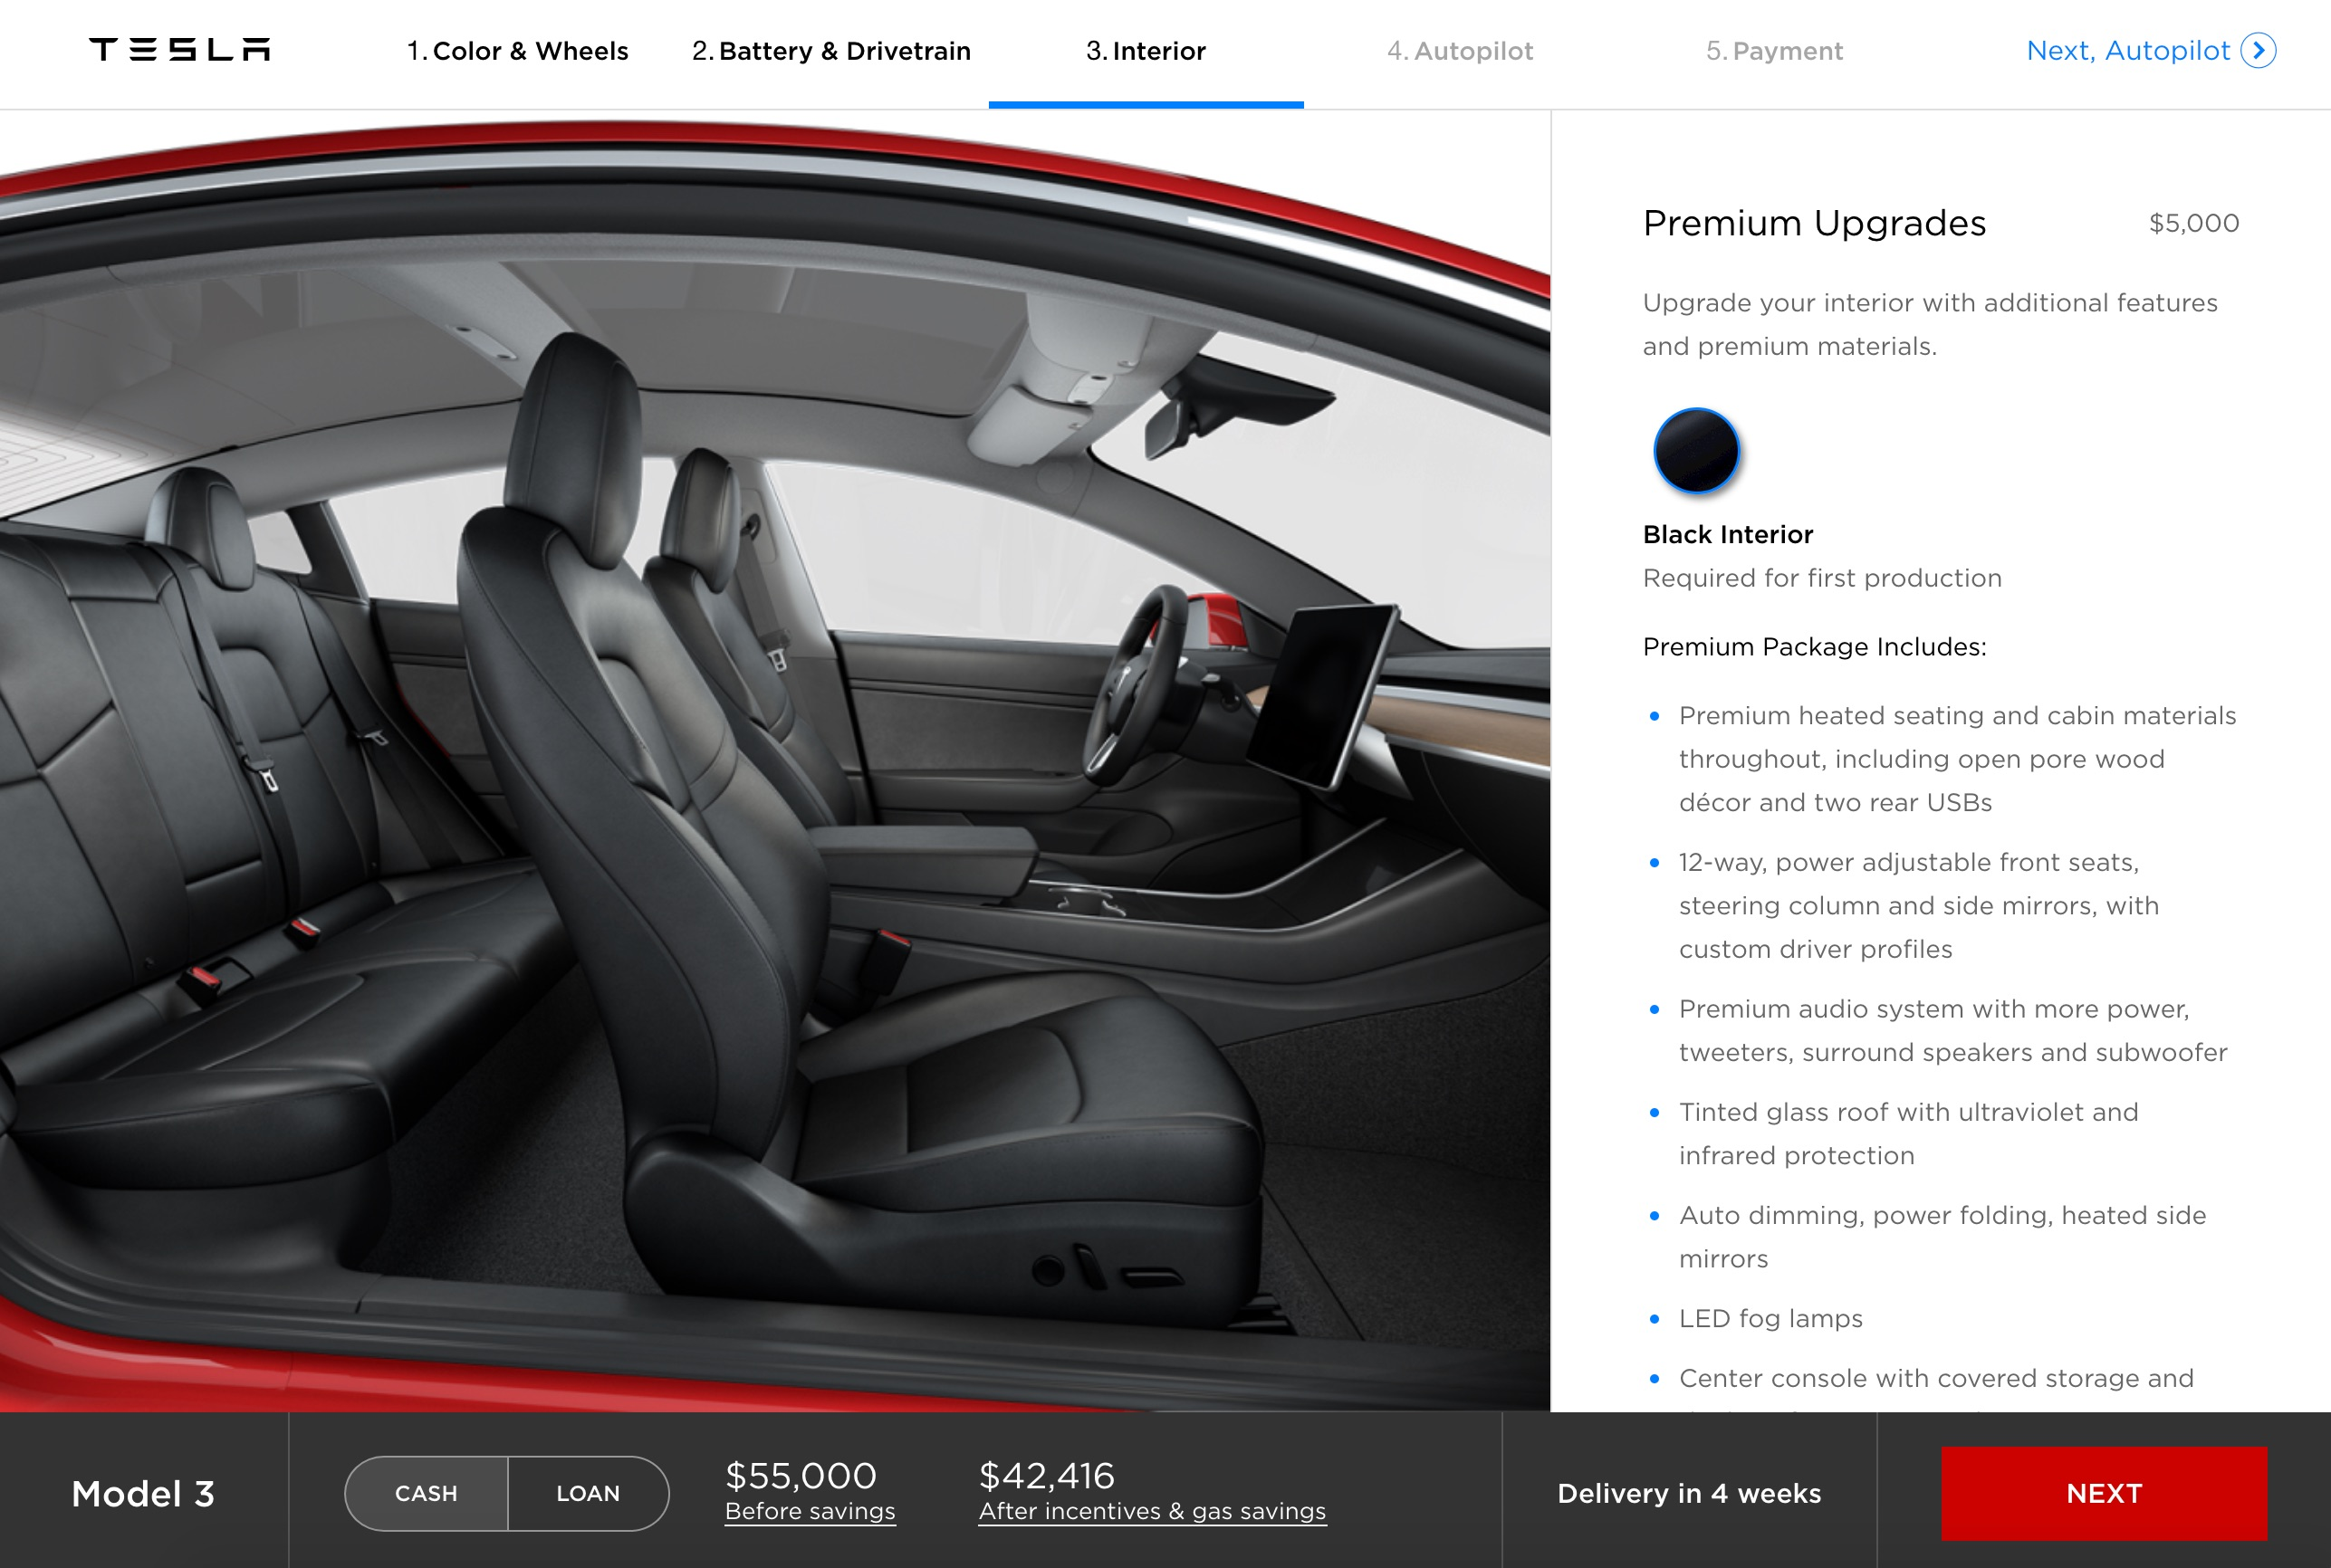 model-3-online-configurator-premium-upgrades-jan-2018